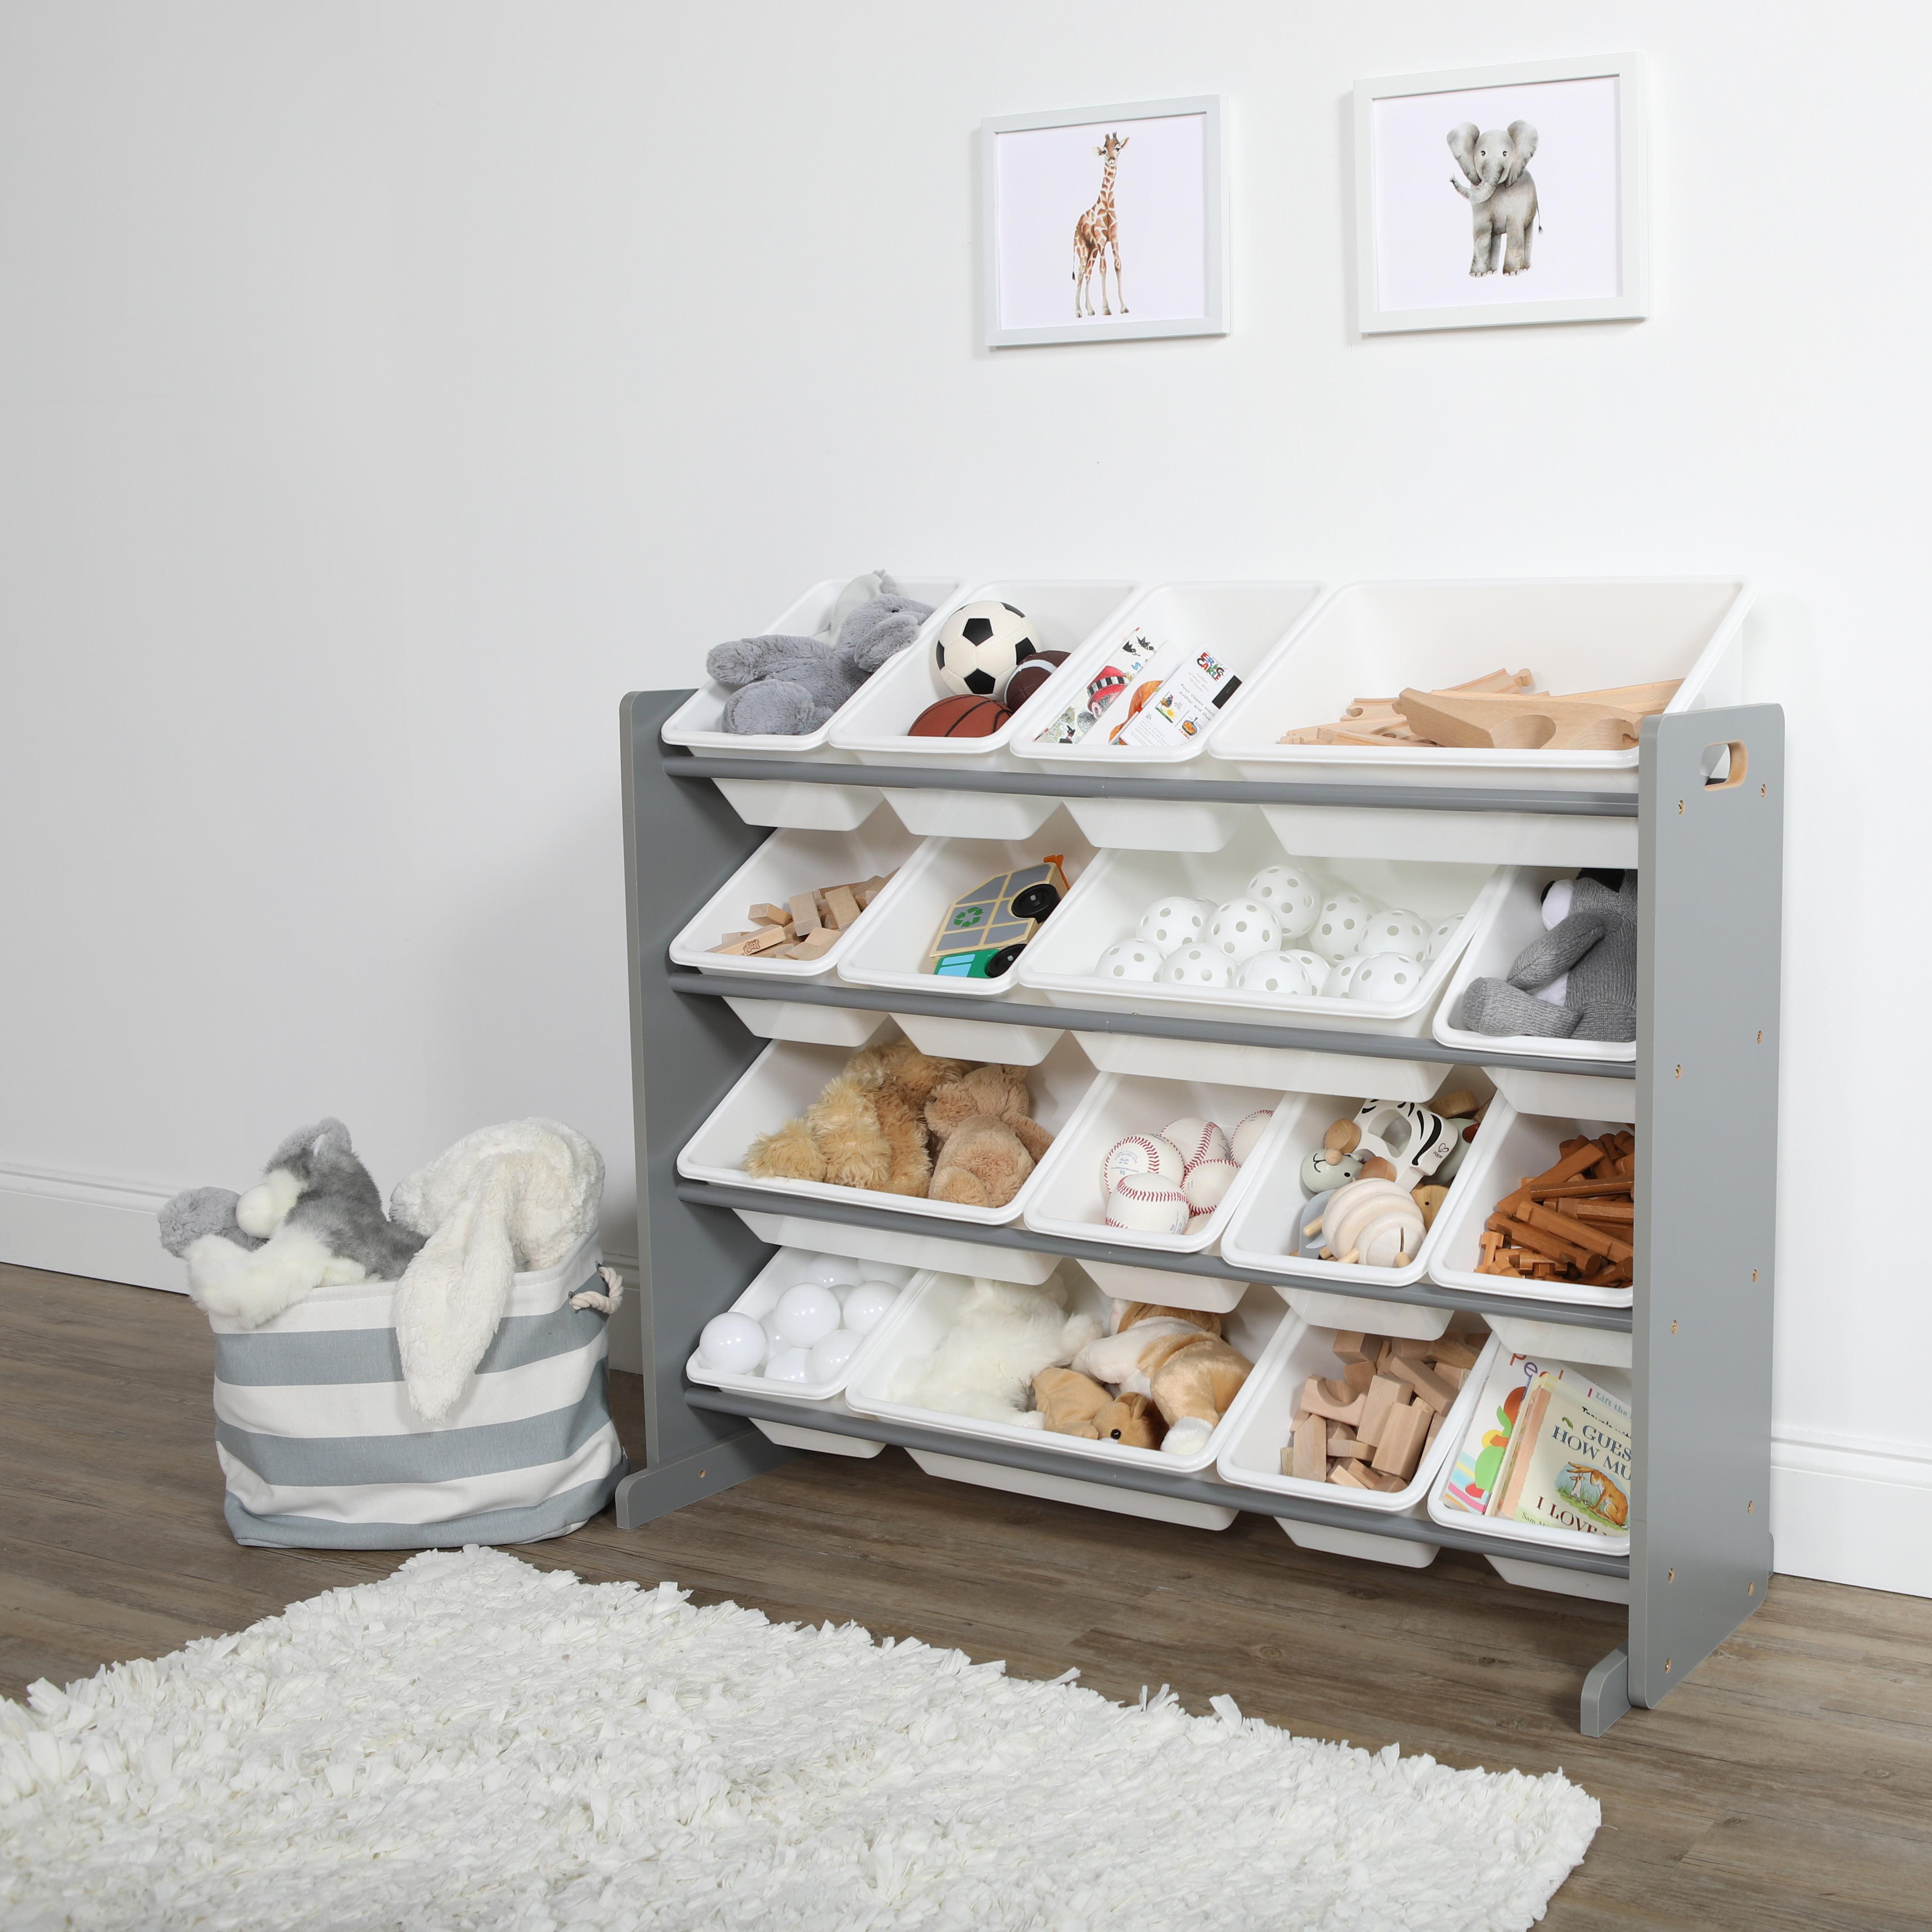 2019 New Wardrobe Kids Organizer Bins Box For Toys: Tot Tutors Grey/White Super-Sized Kids Toy Storage